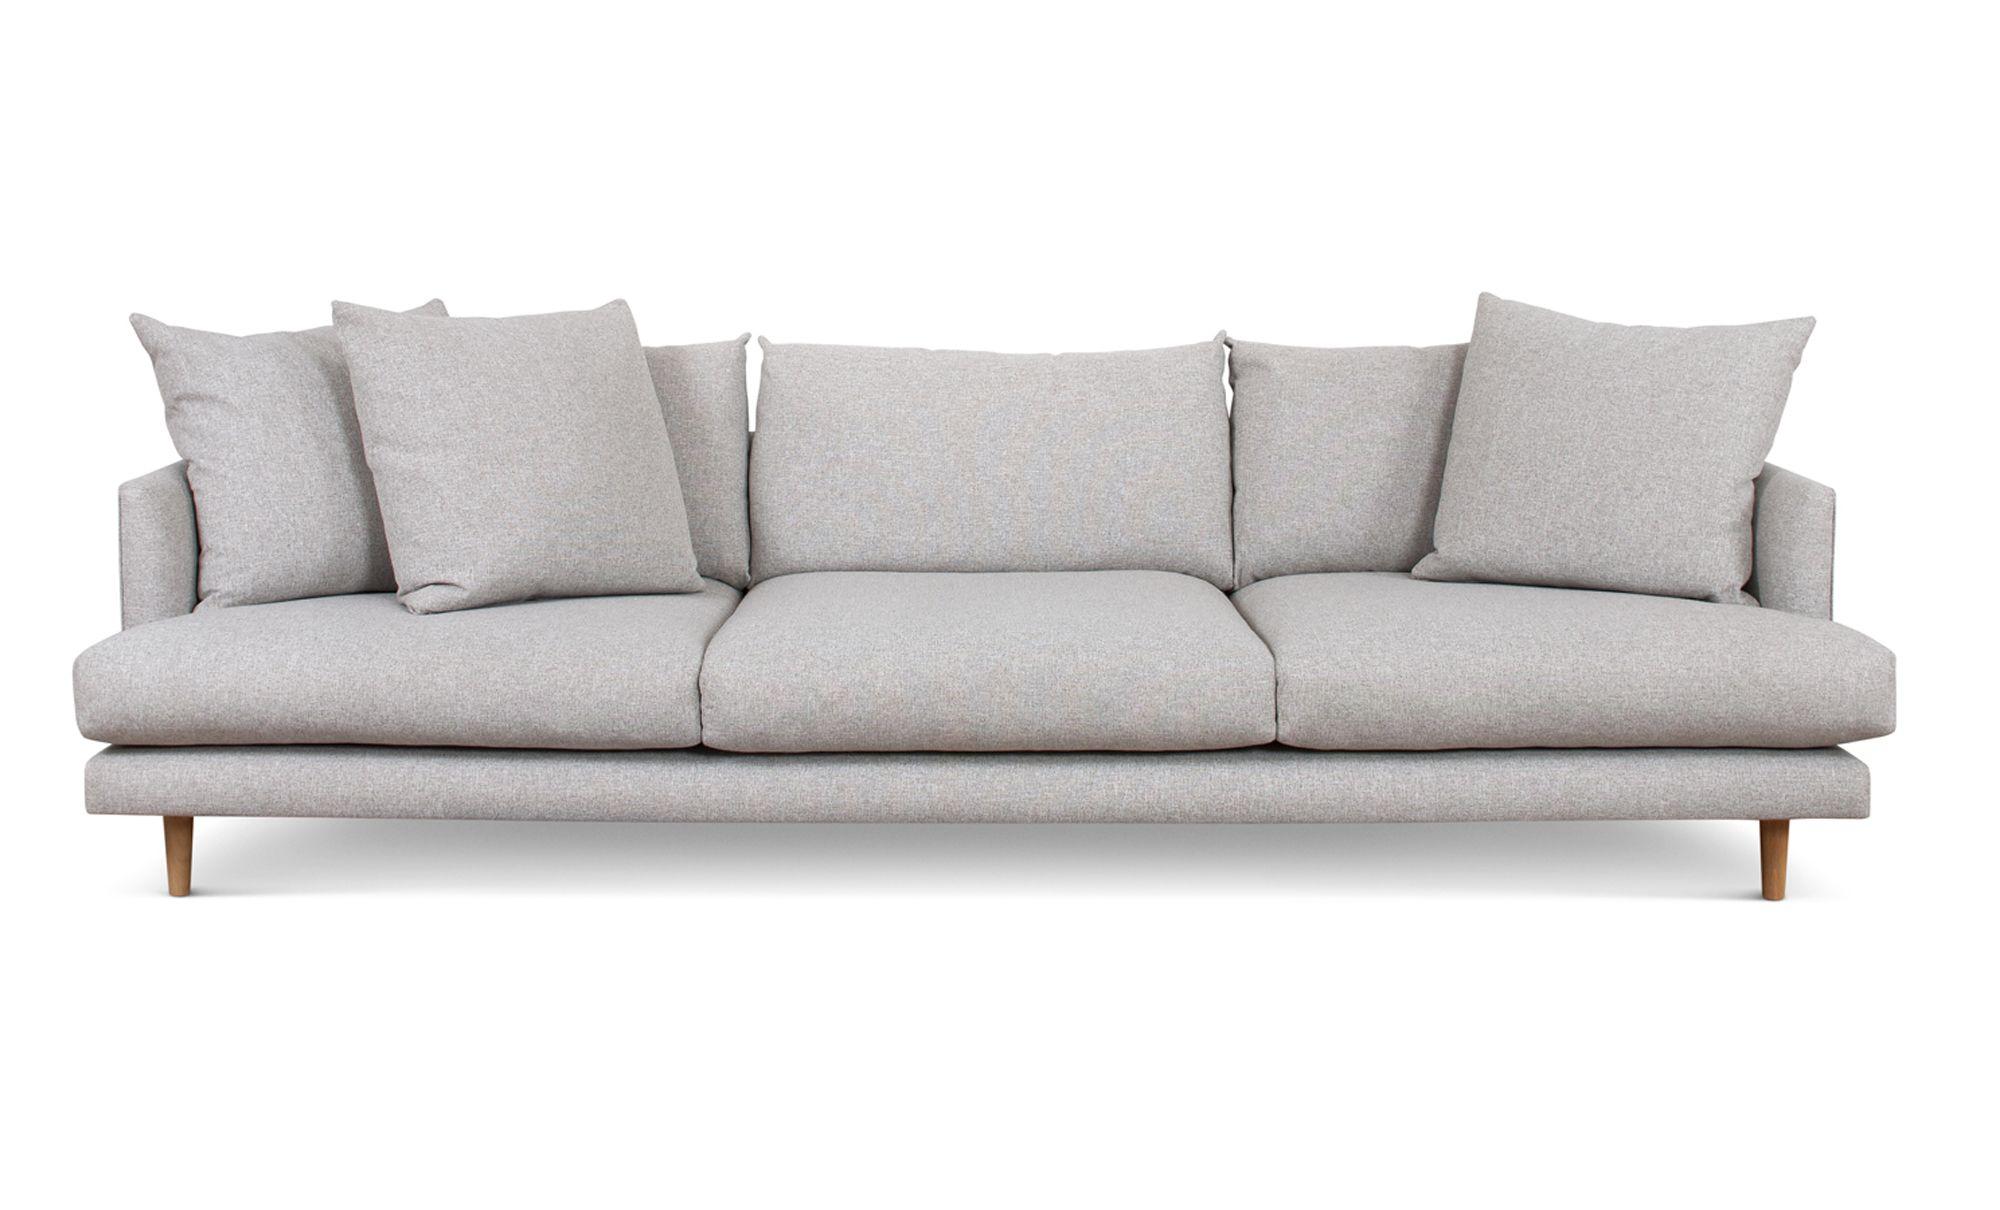 Deep Sofas In 2019 Deep Sofa Sofa Furniture